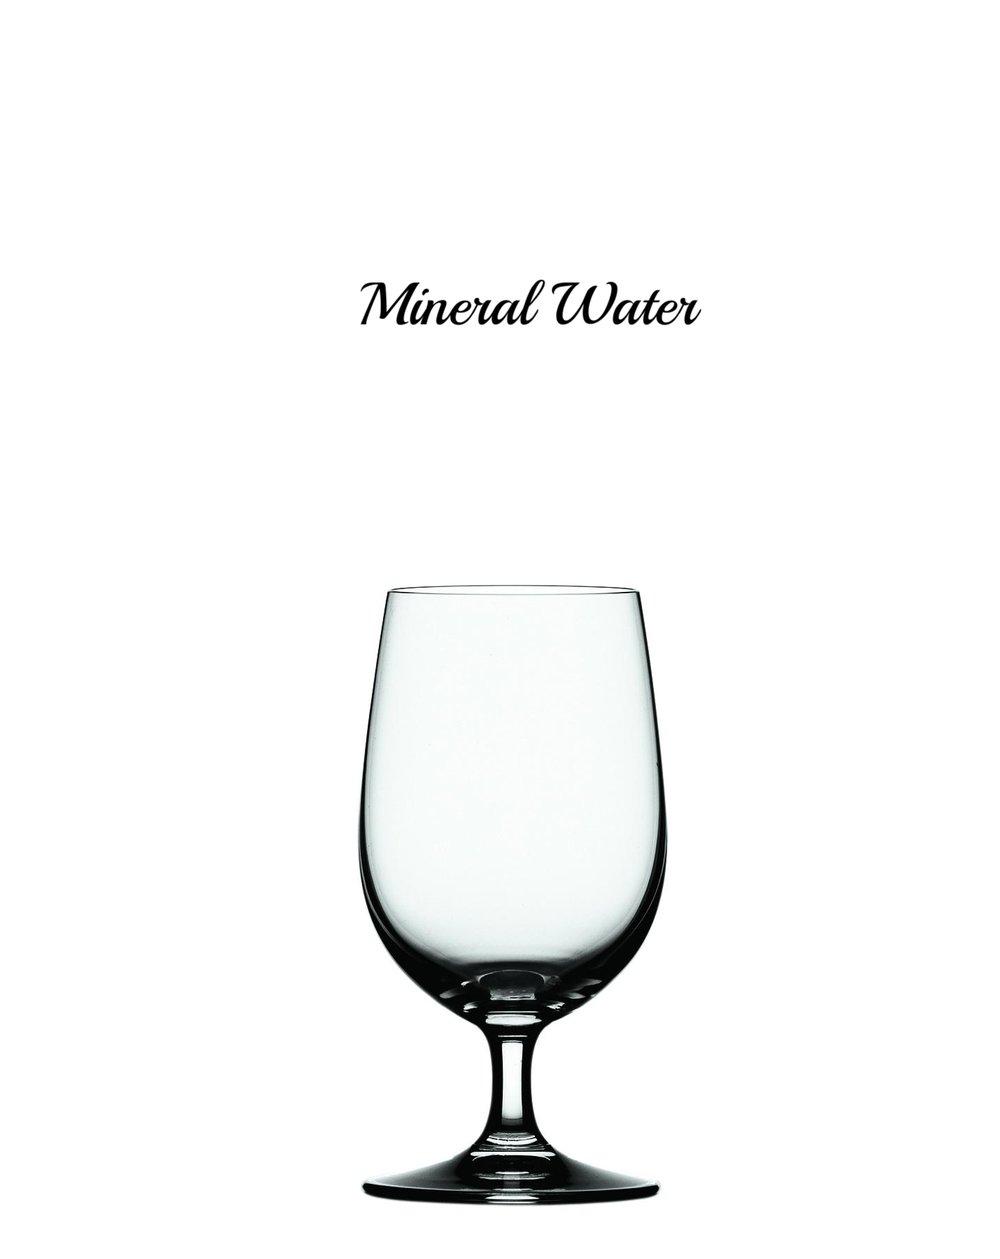 Festival Mineral Water 4028011.jpg